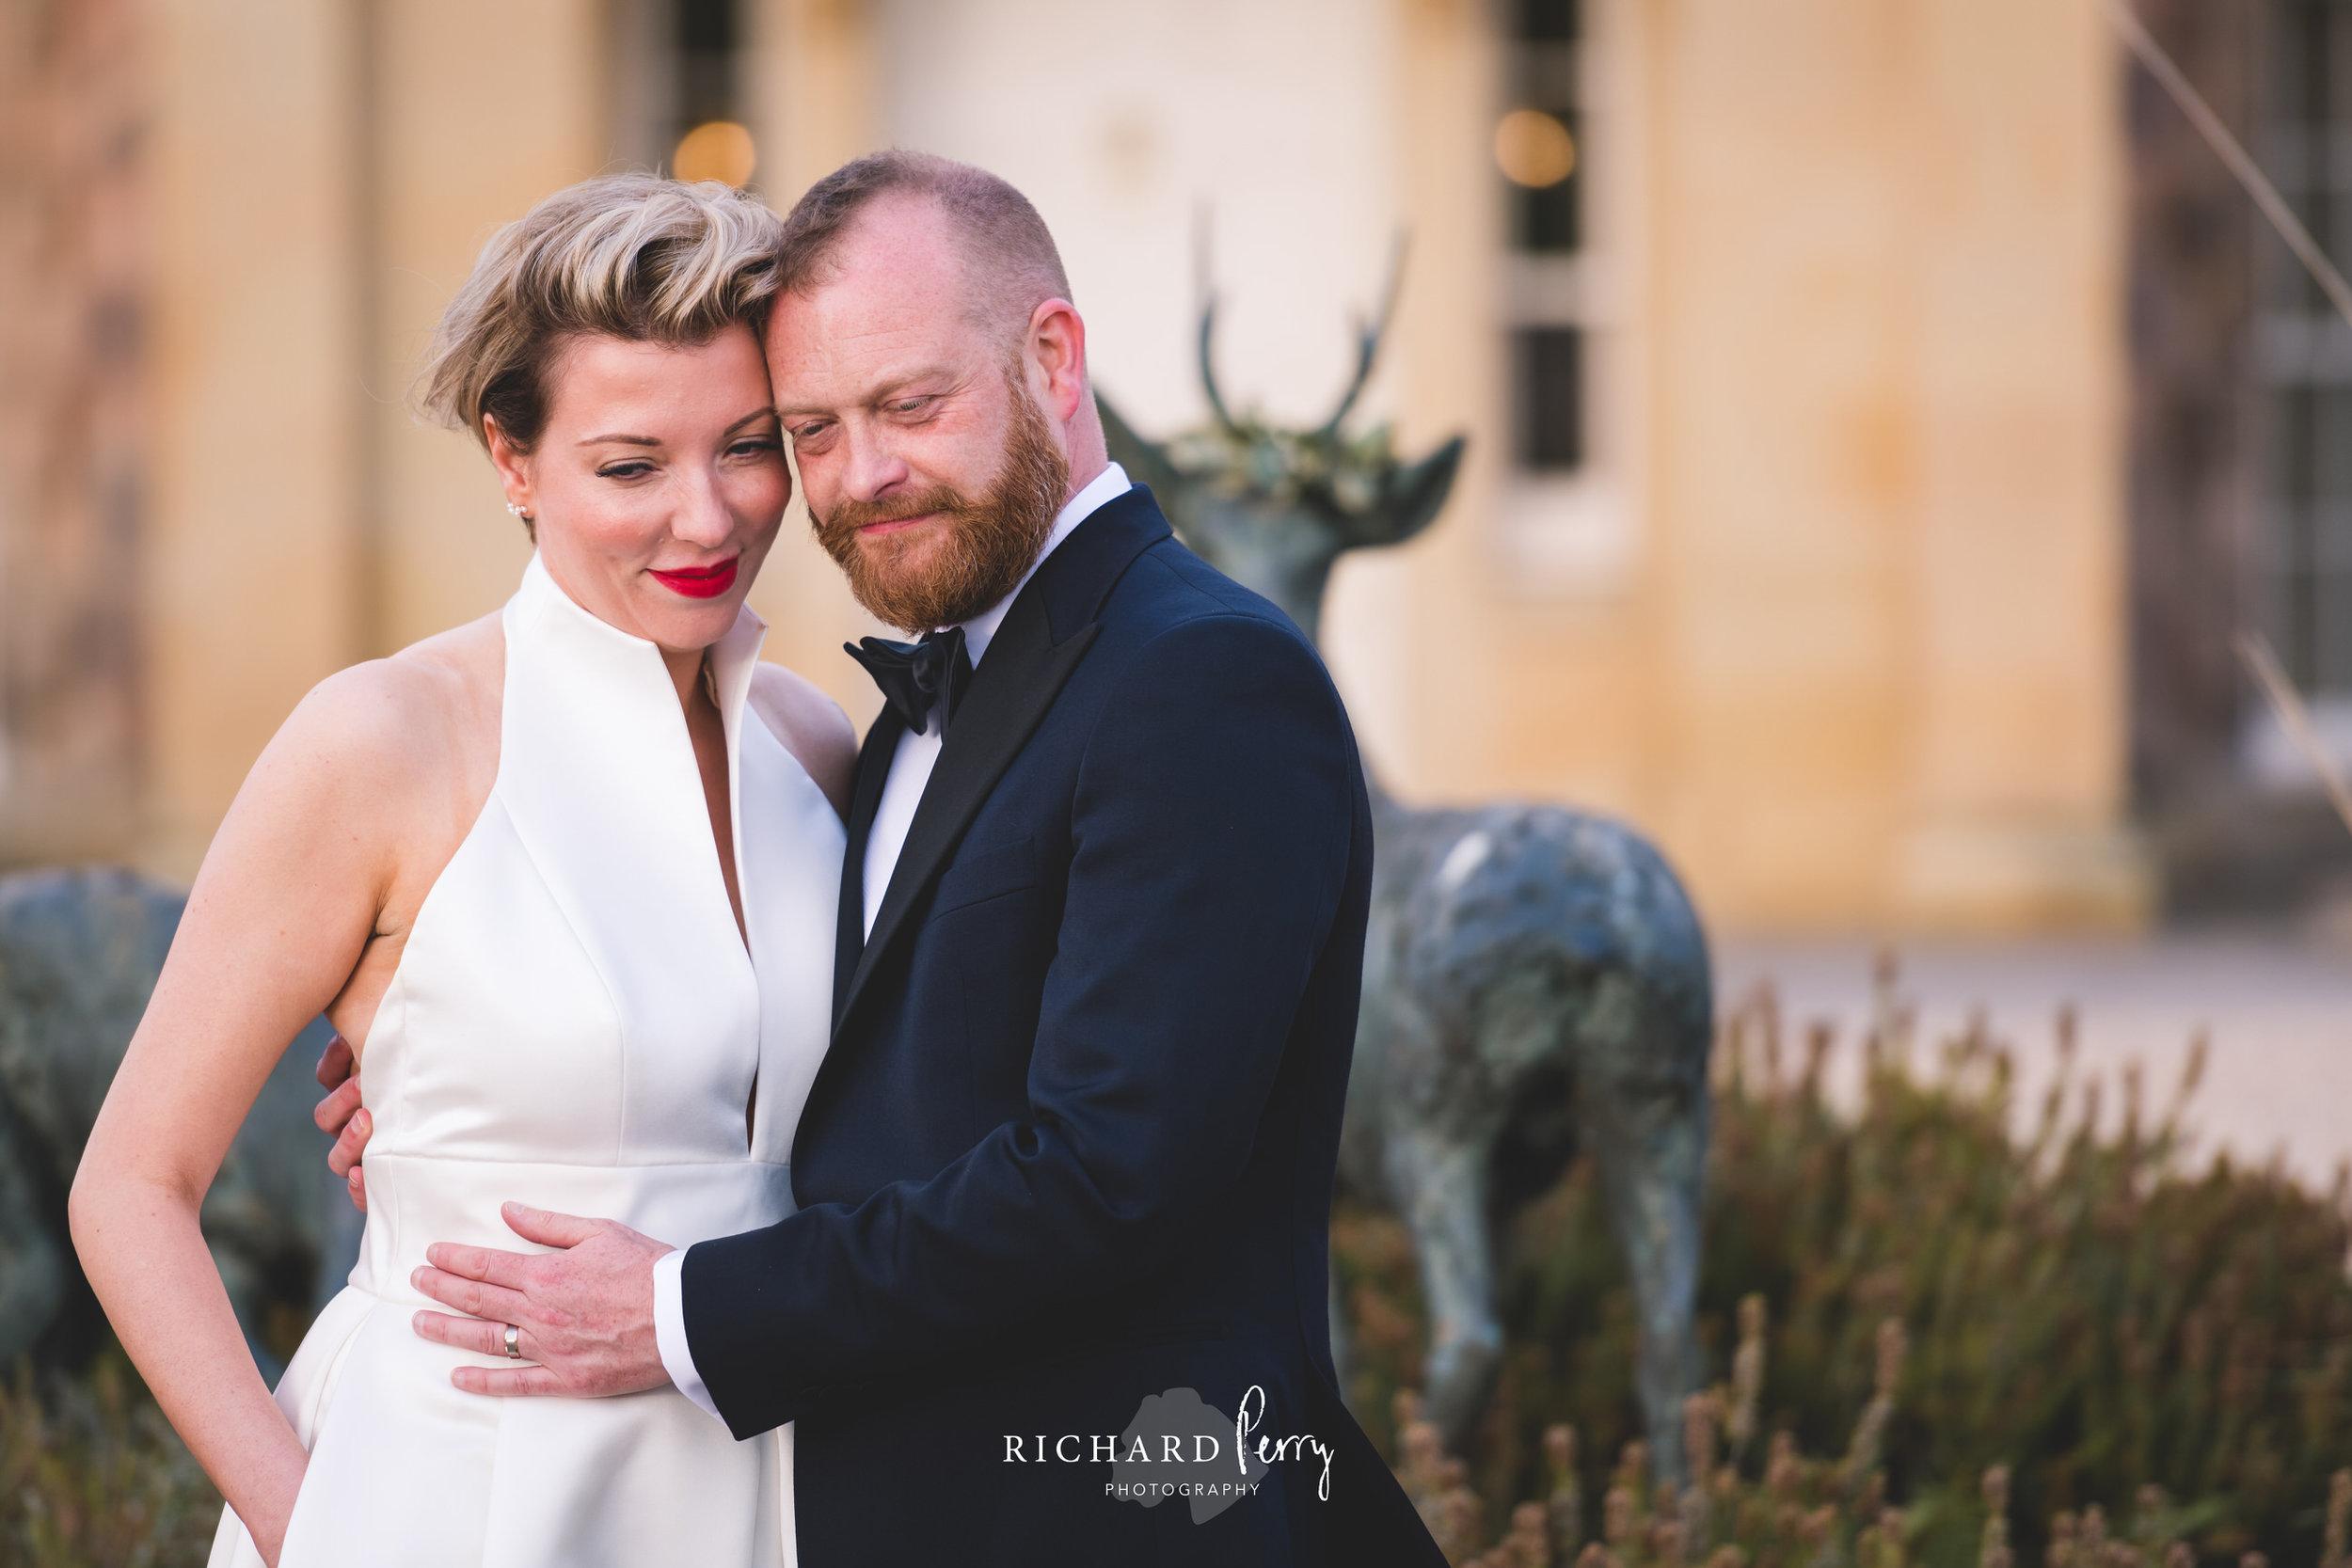 yorkshire-wedding-photographer-destination-archerfield-house-23.jpg